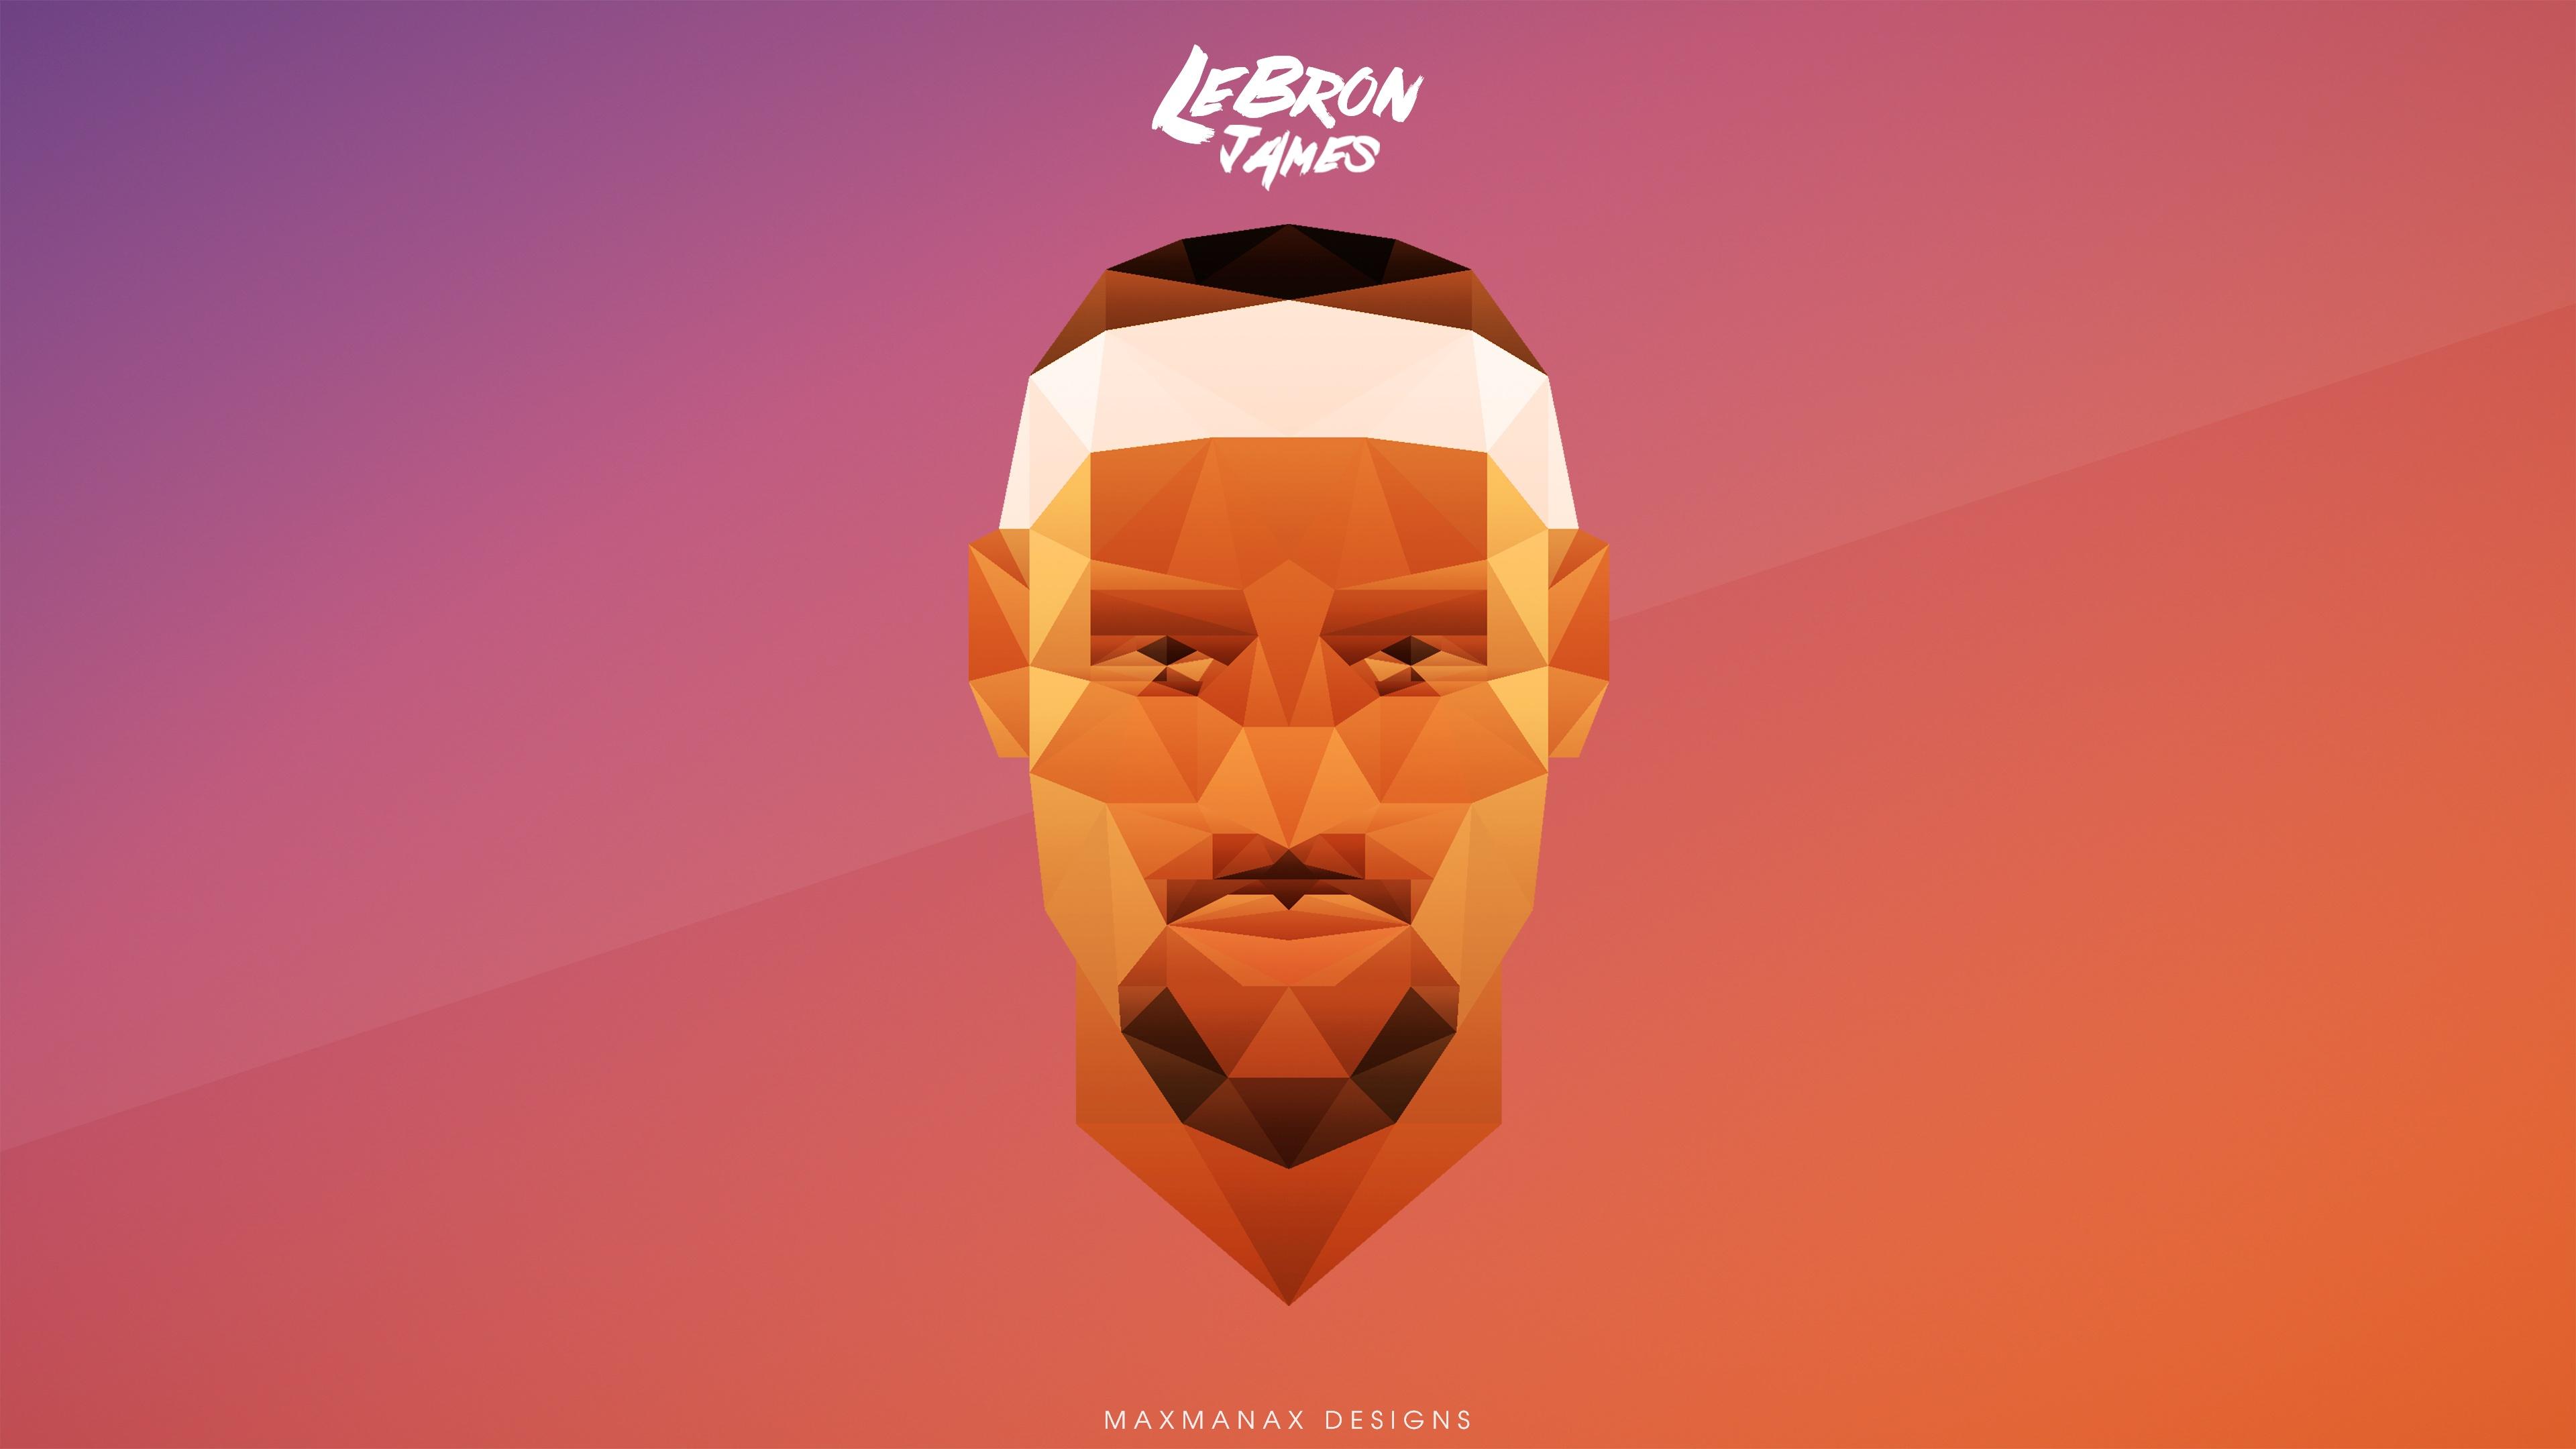 Lebron james wallpaper wallpapers for free download about 3041 lebron james 4k voltagebd Images